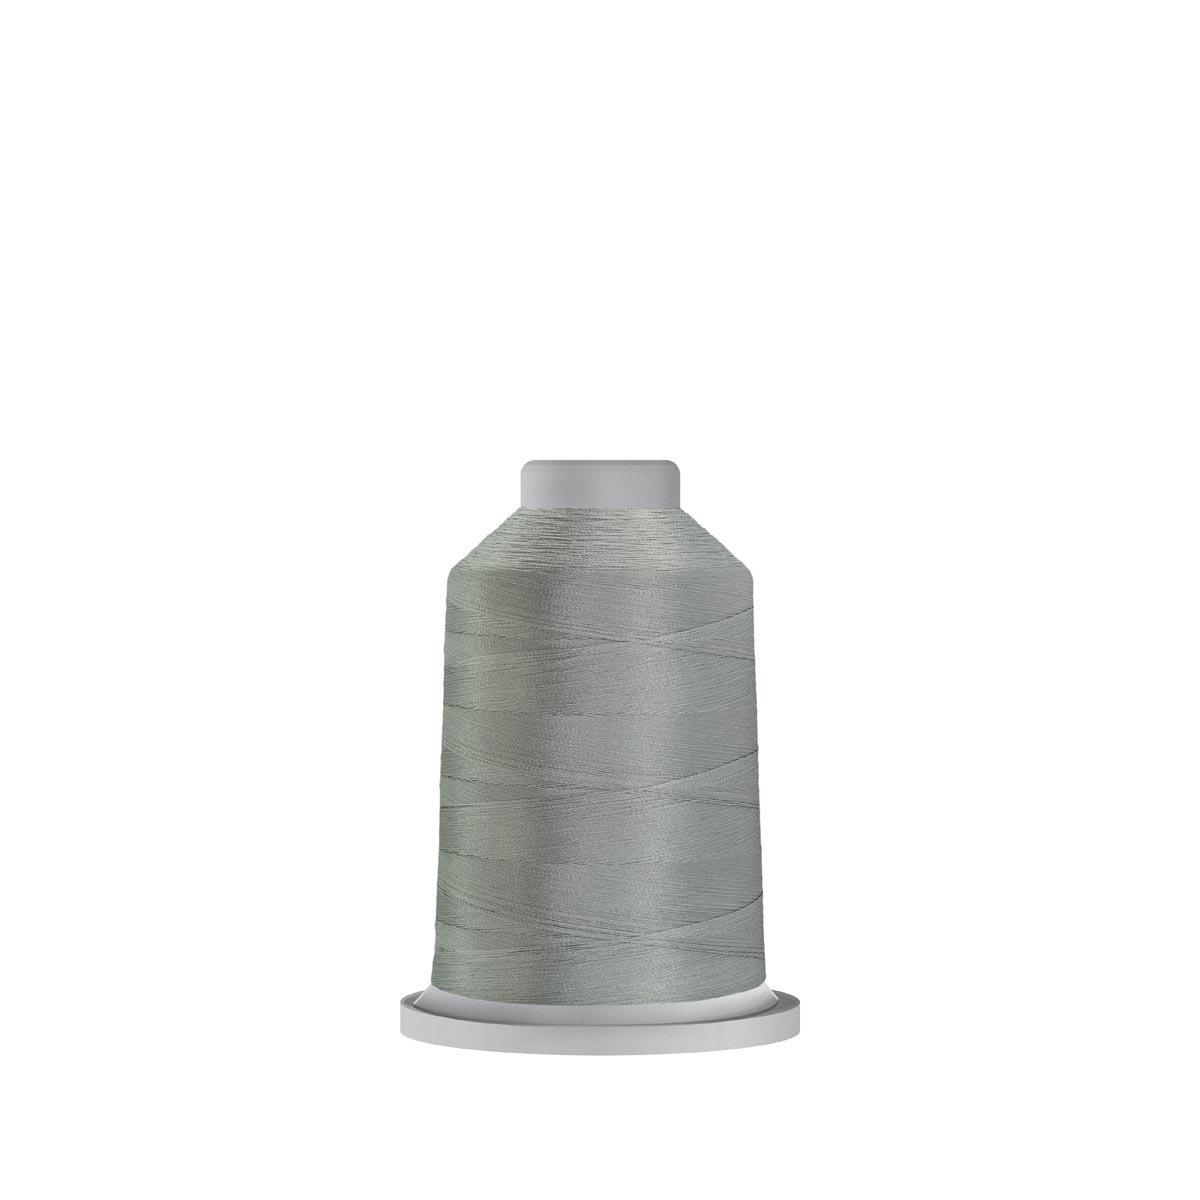 Glide Trilobal Polyester No. 40 Thread - Light Grey